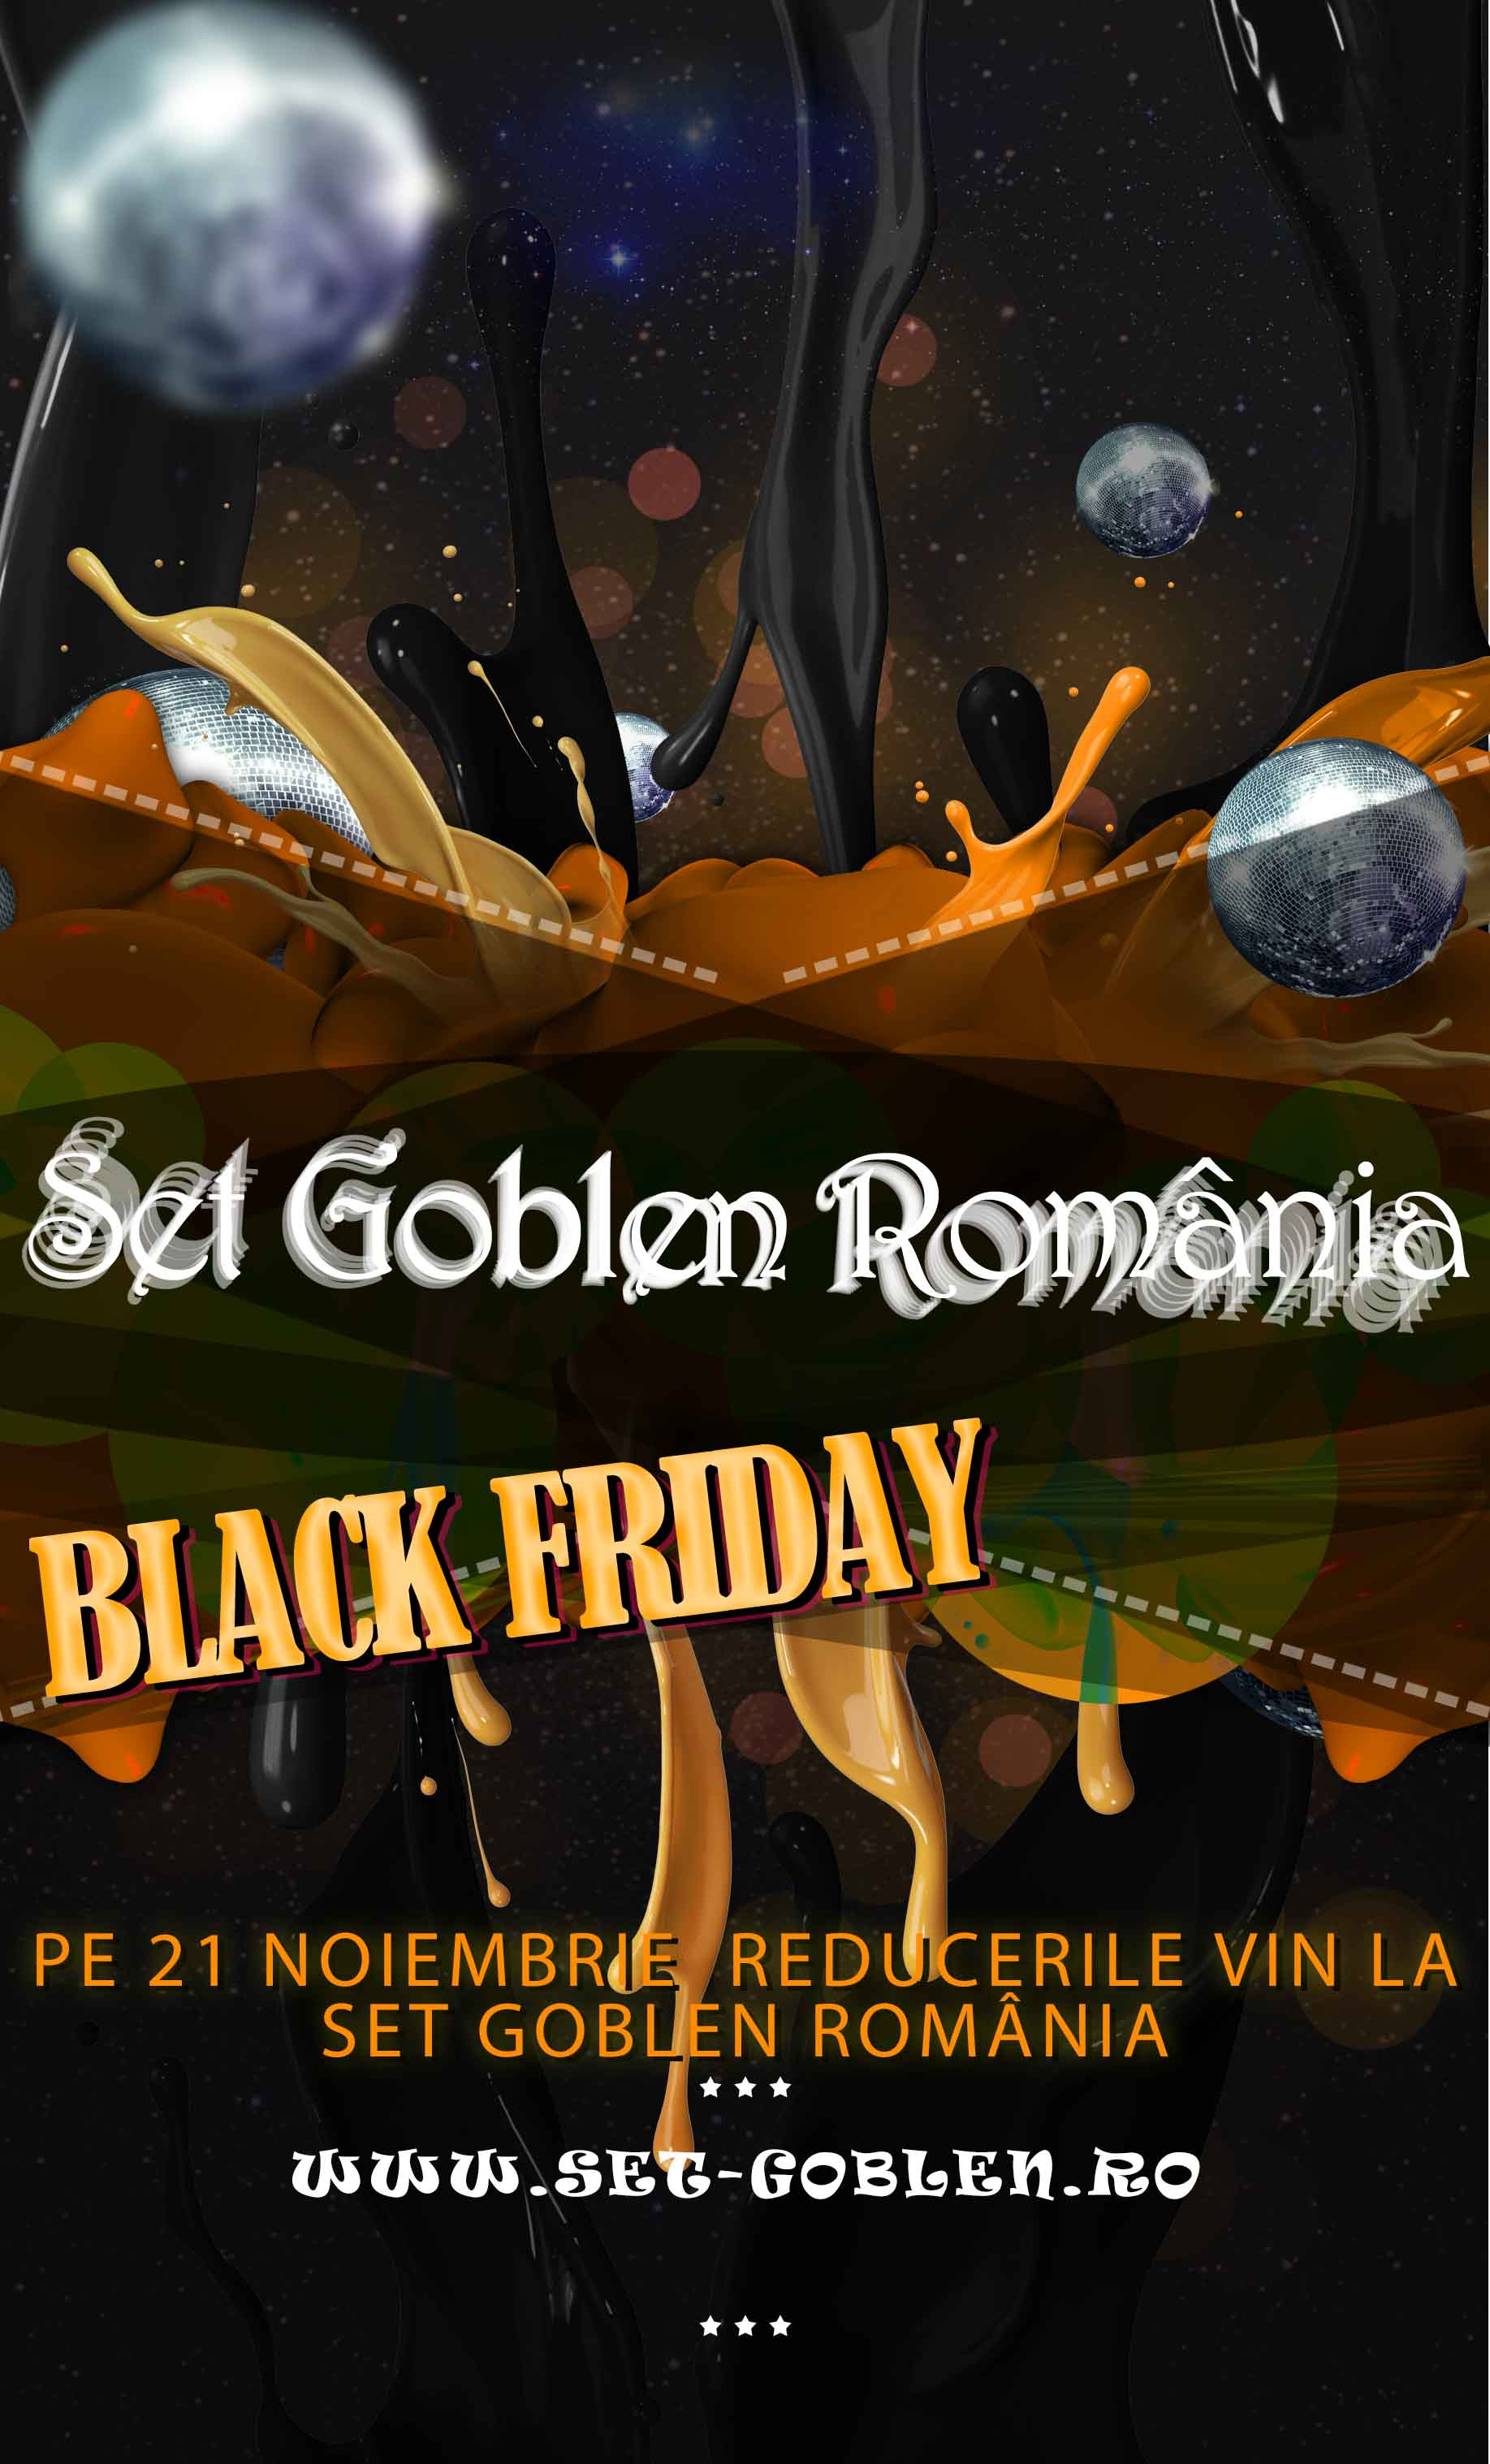 Pe 21 Noiembrie sarbatorim  Black Friday la Set Goblen Romania